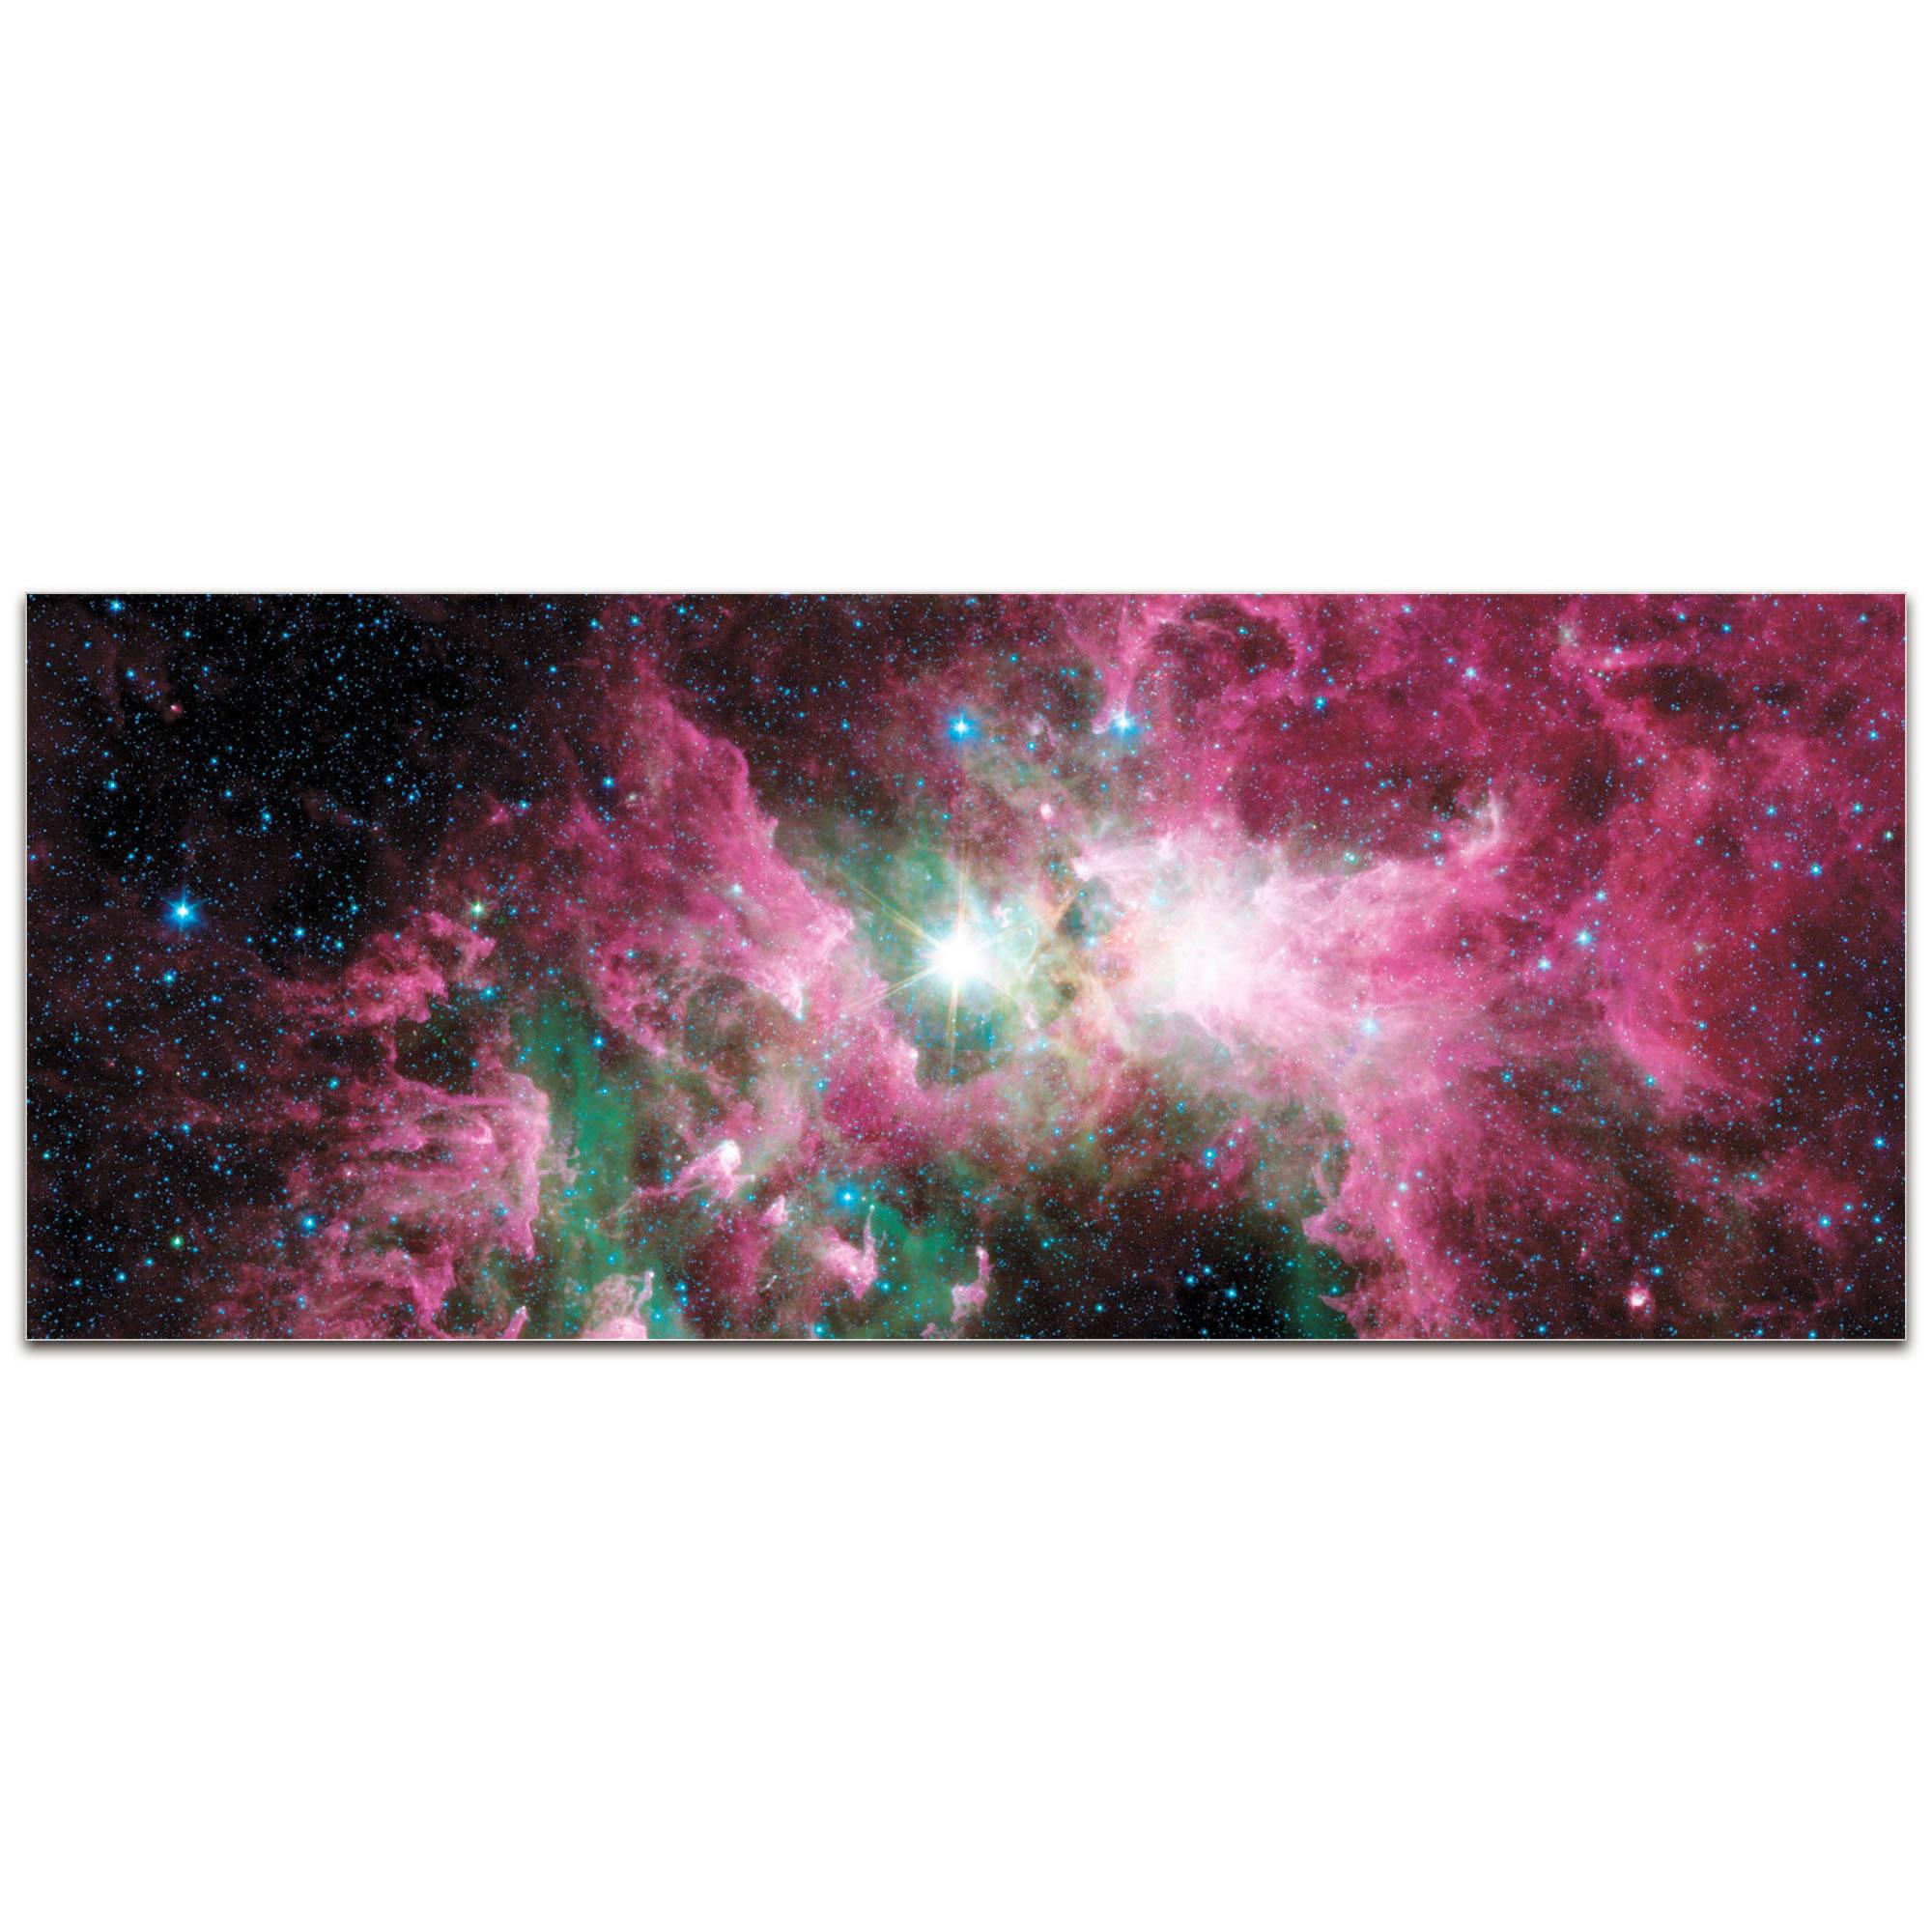 Carina Nebula - Modern Wall Decor